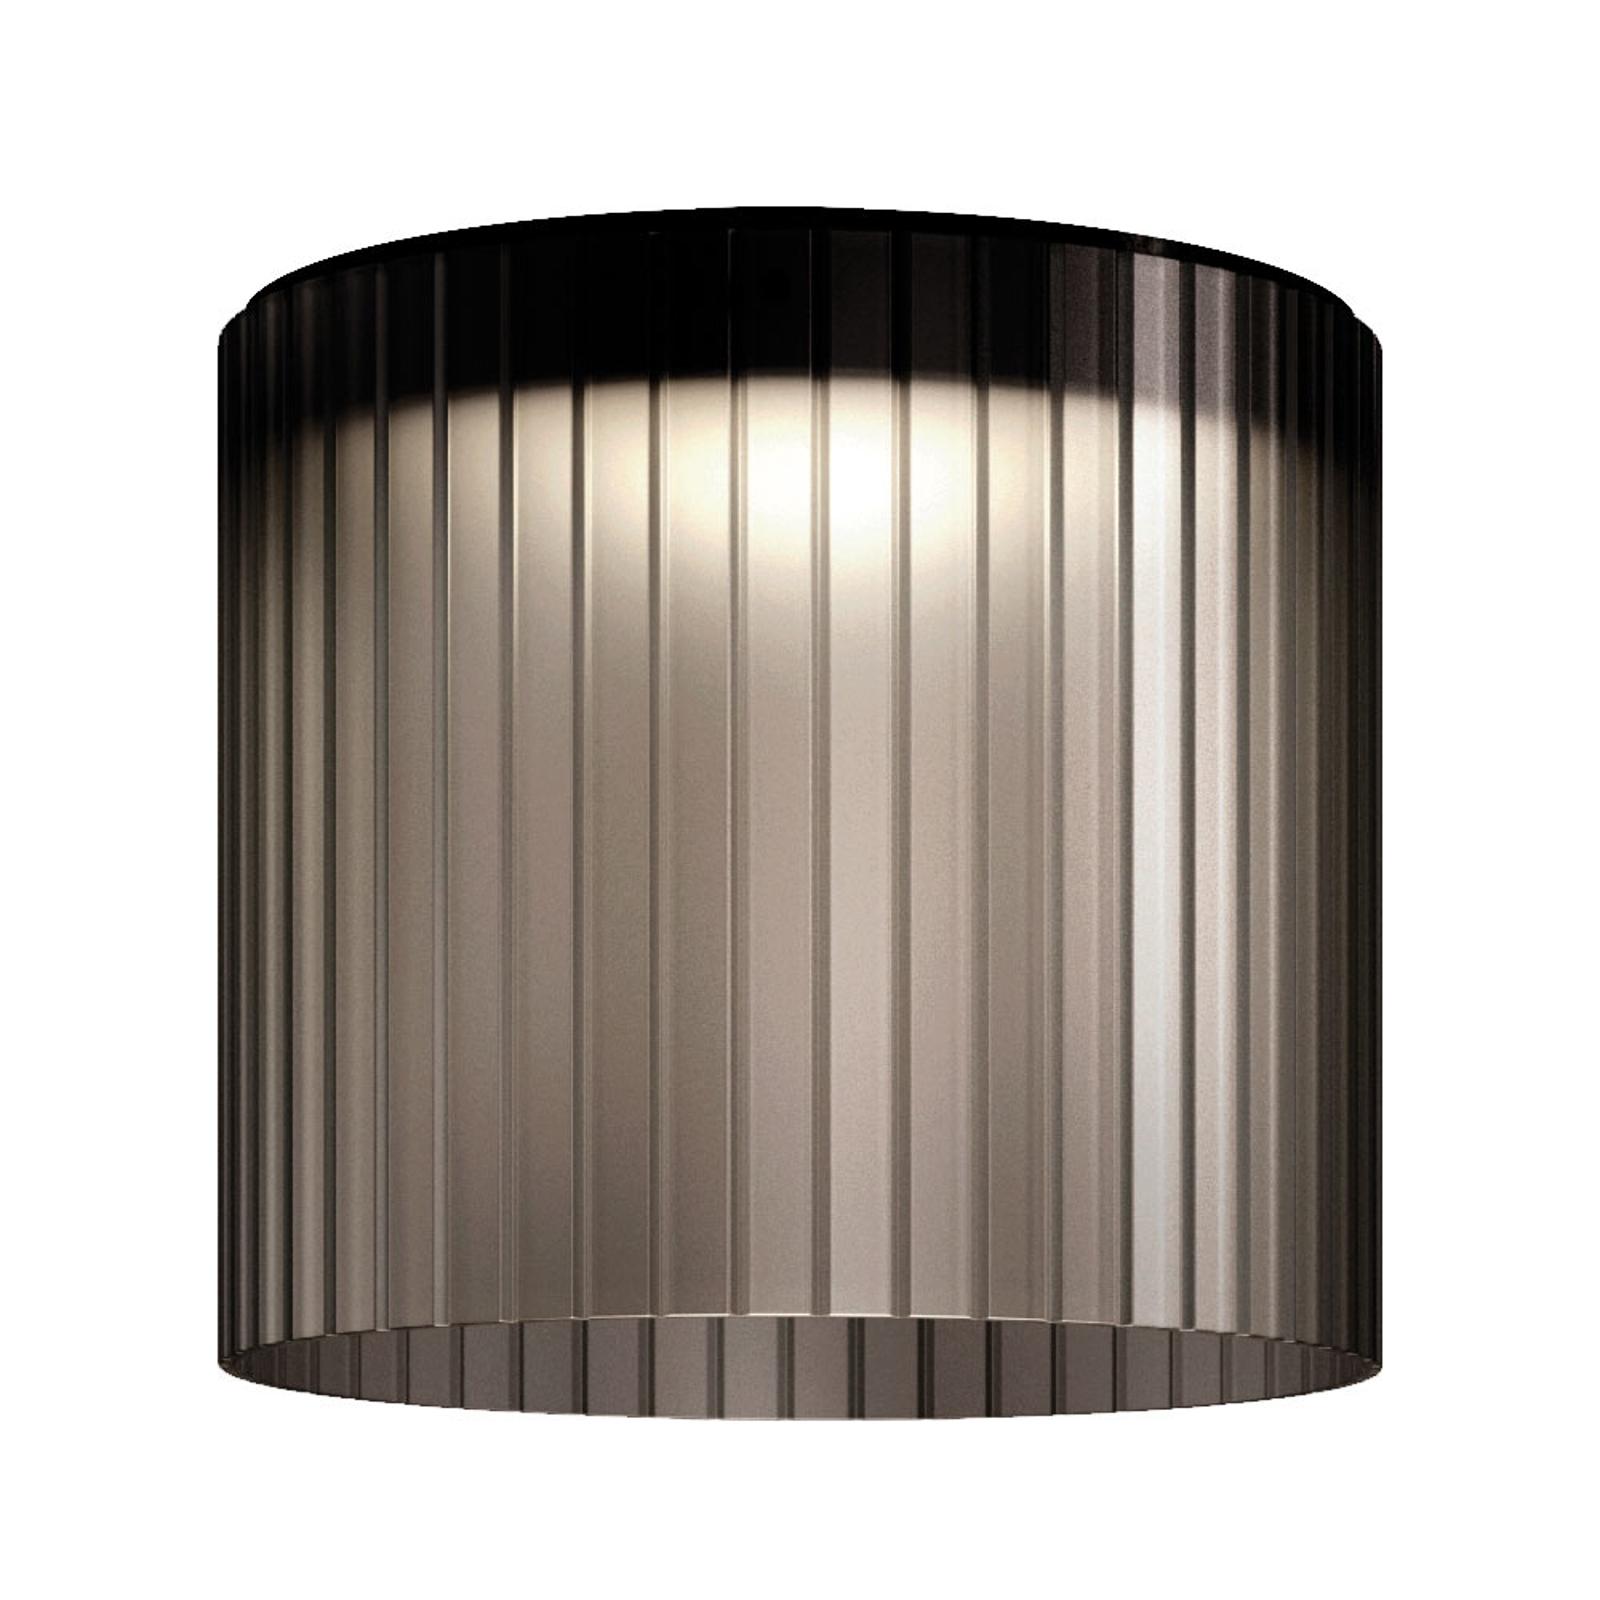 Kundalini Giass -LED-kattovalaisin Ø 40 cm harmaa